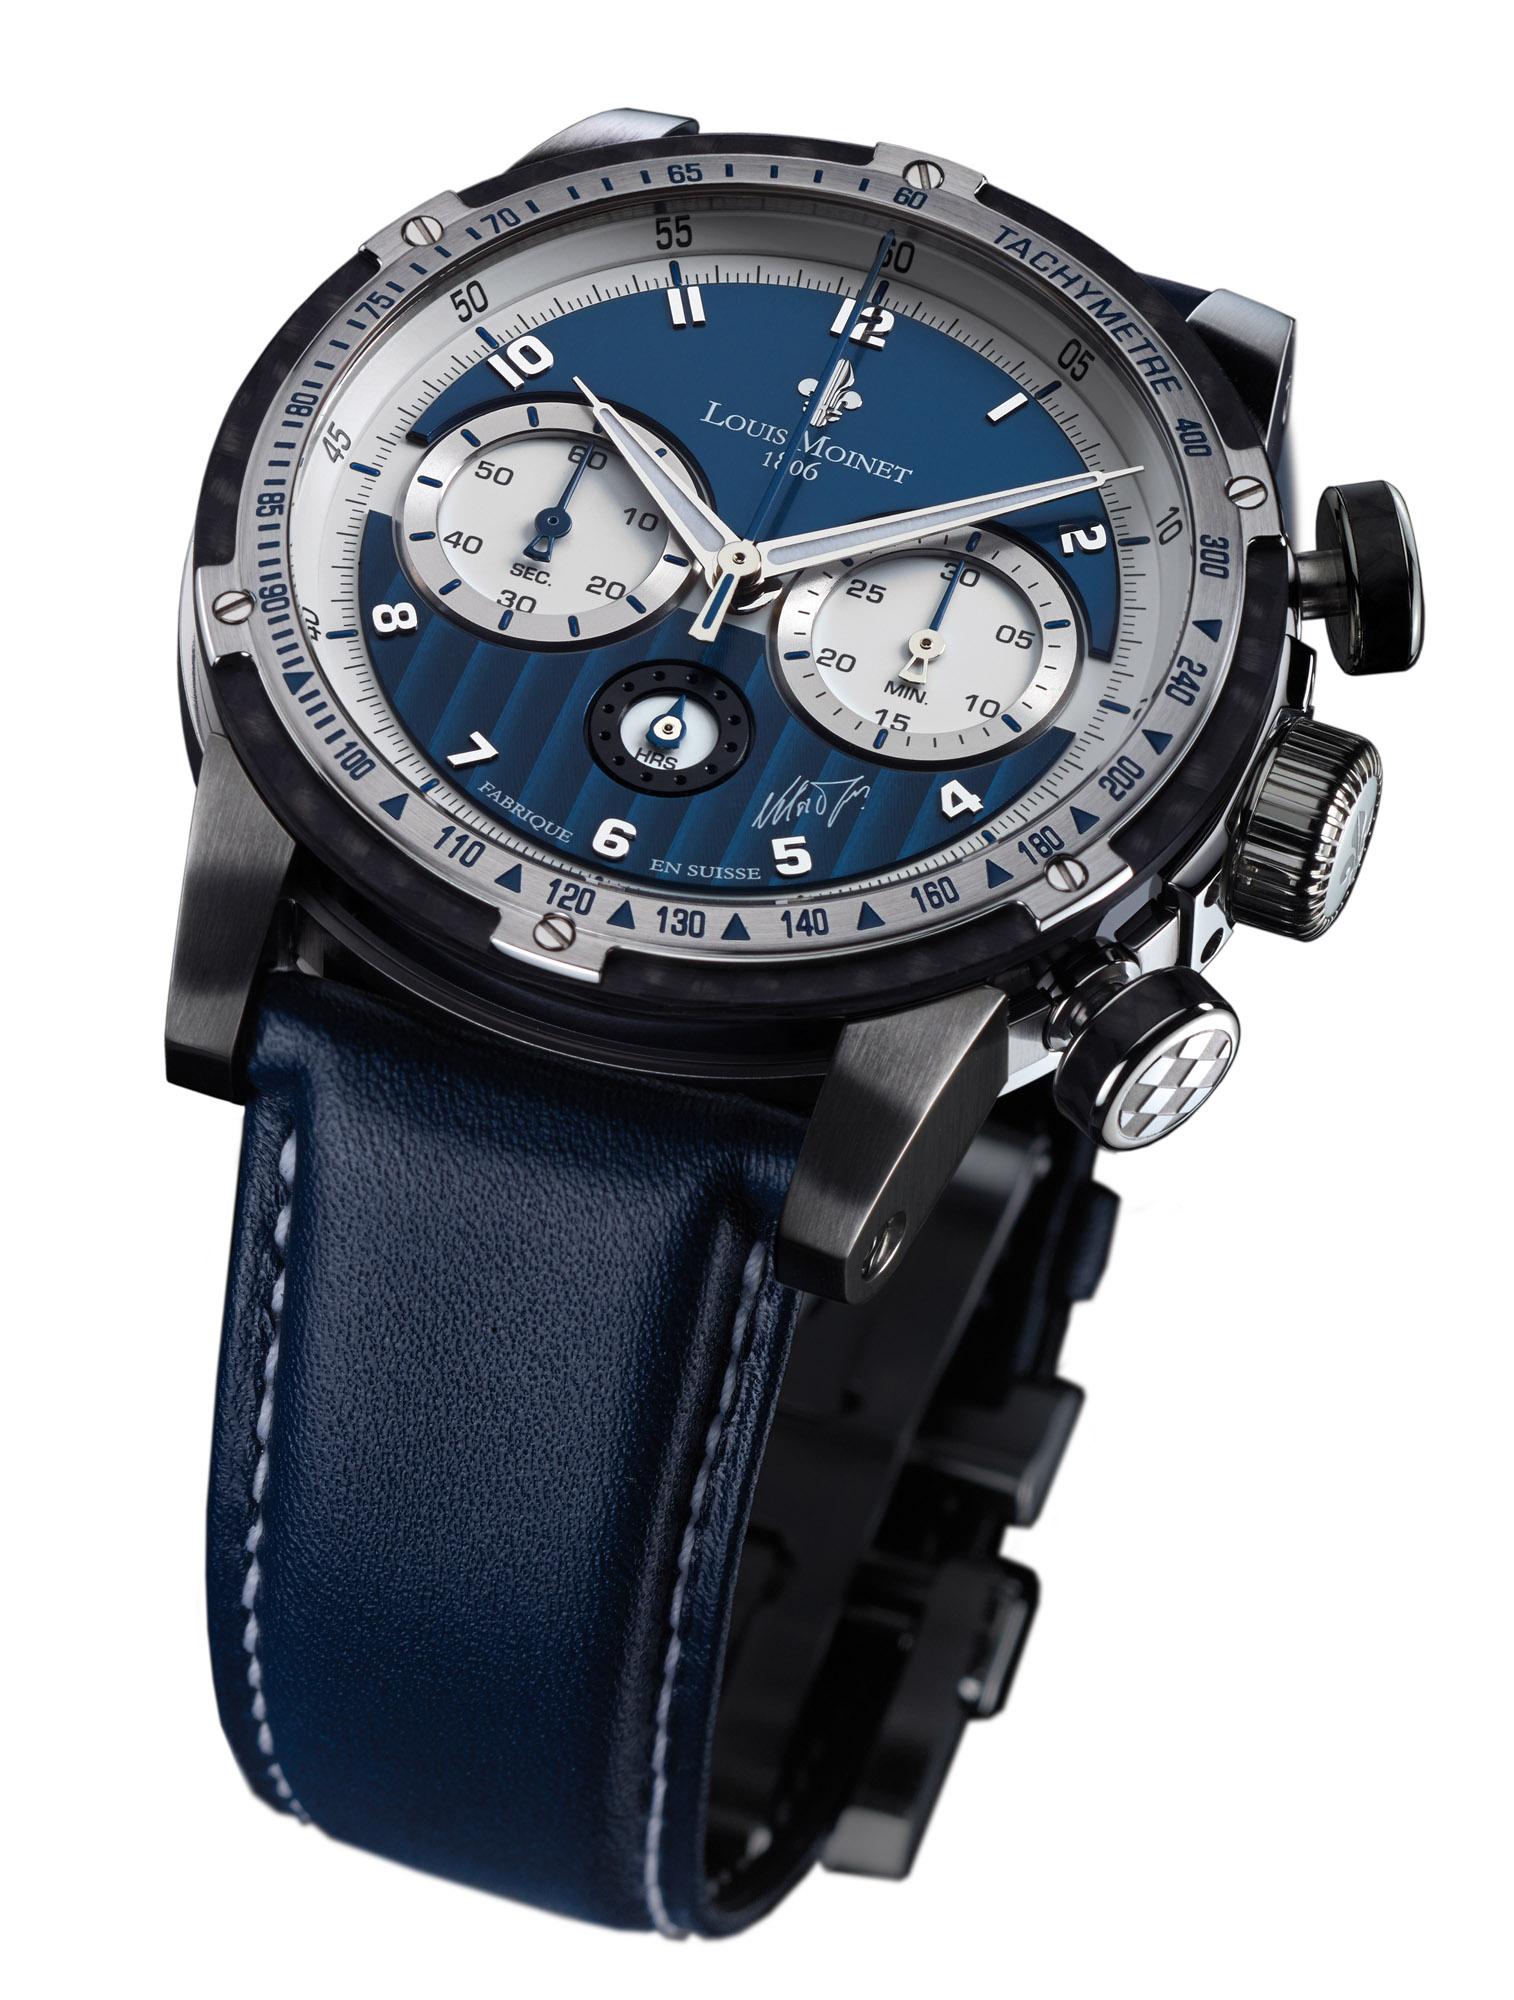 A Stylish Watch For Men-Louis Moinet Nelson Piquet Chronograph